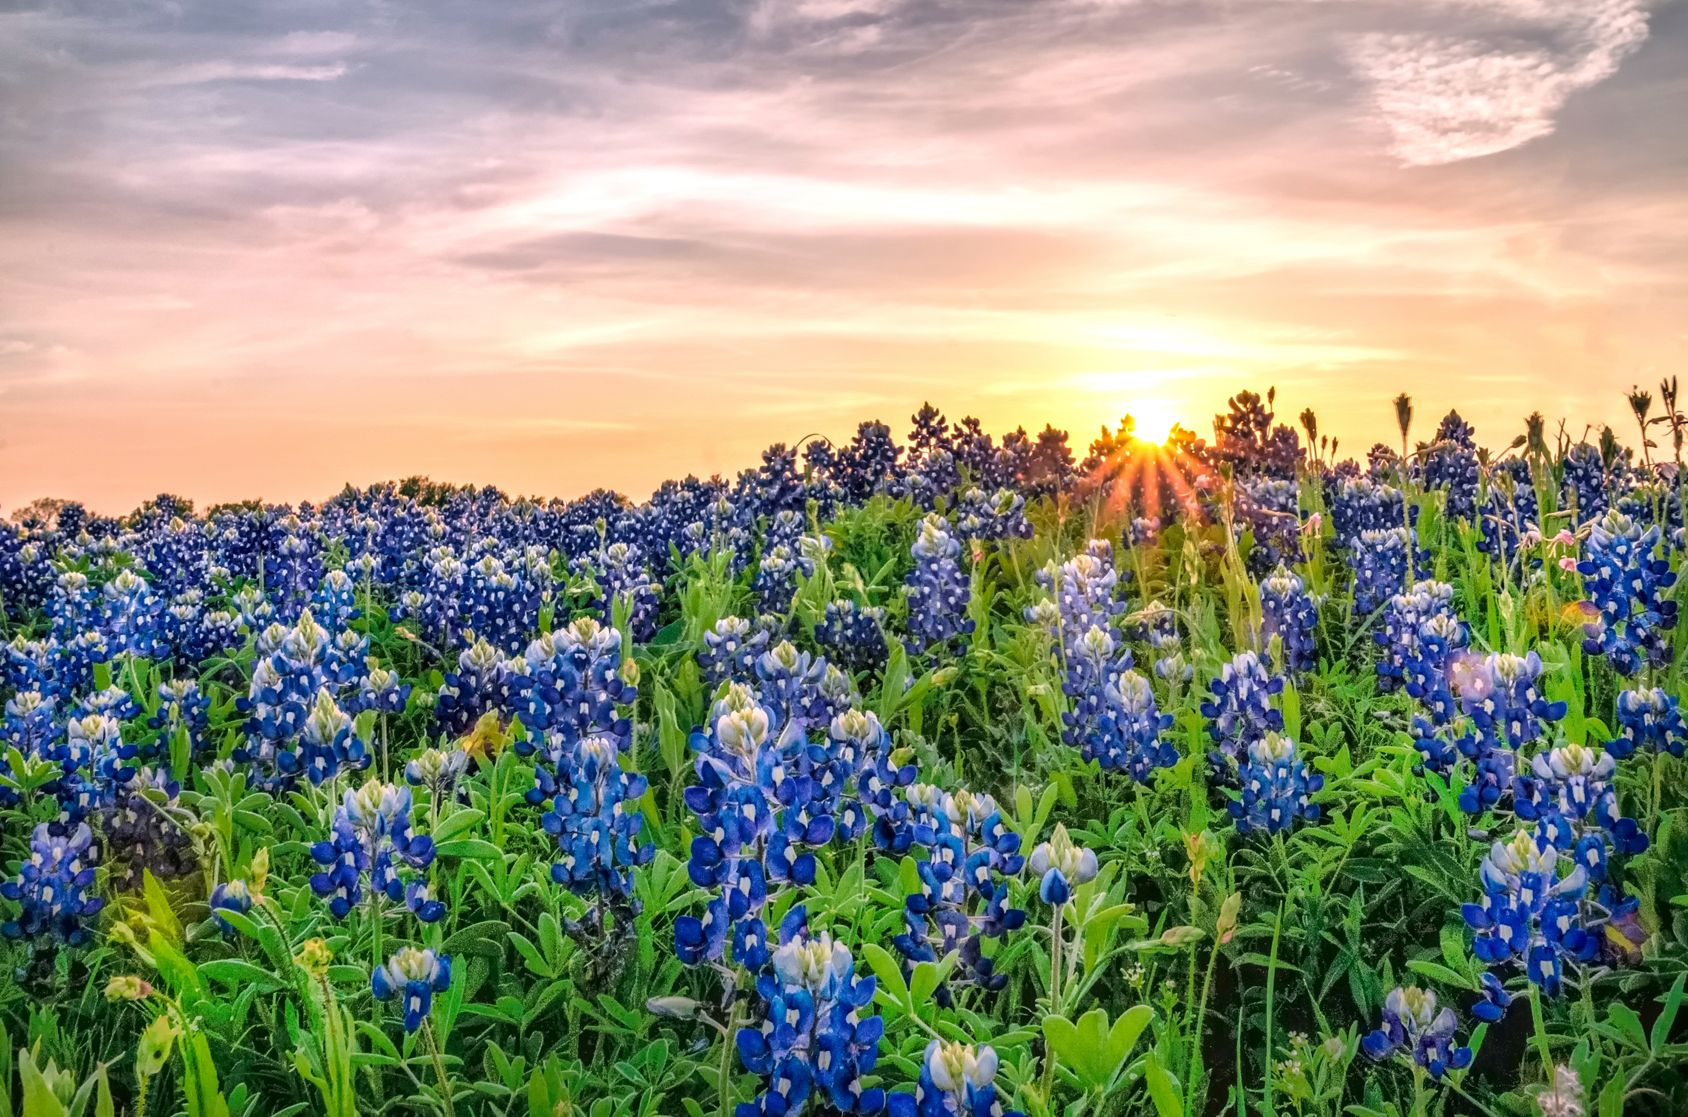 Texas Bluebonnets Bluebonnets Fun Facts And Trivia